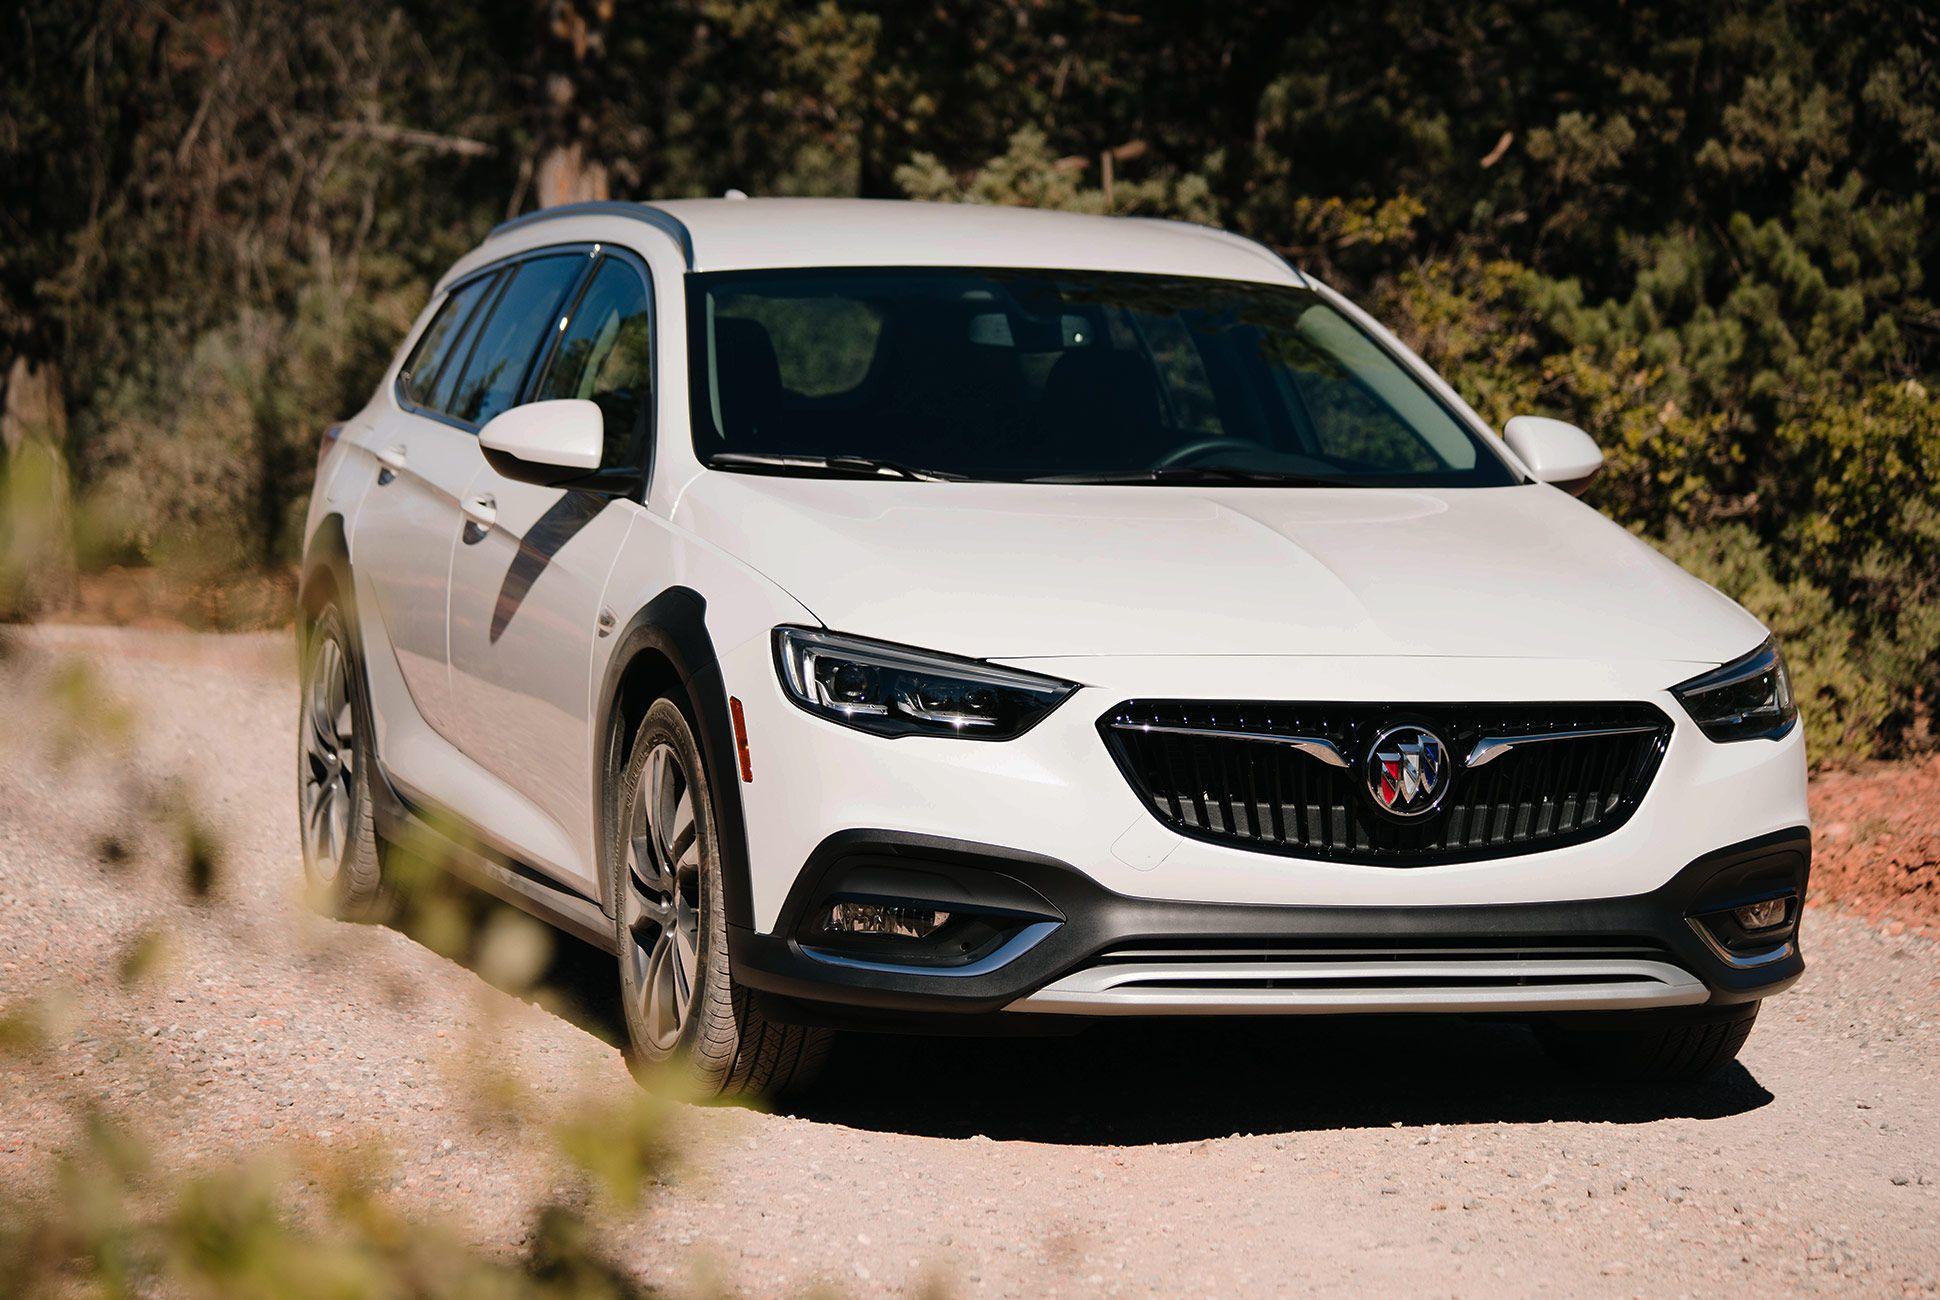 Buick-Regal-TourX-Review-gear-patrol-3